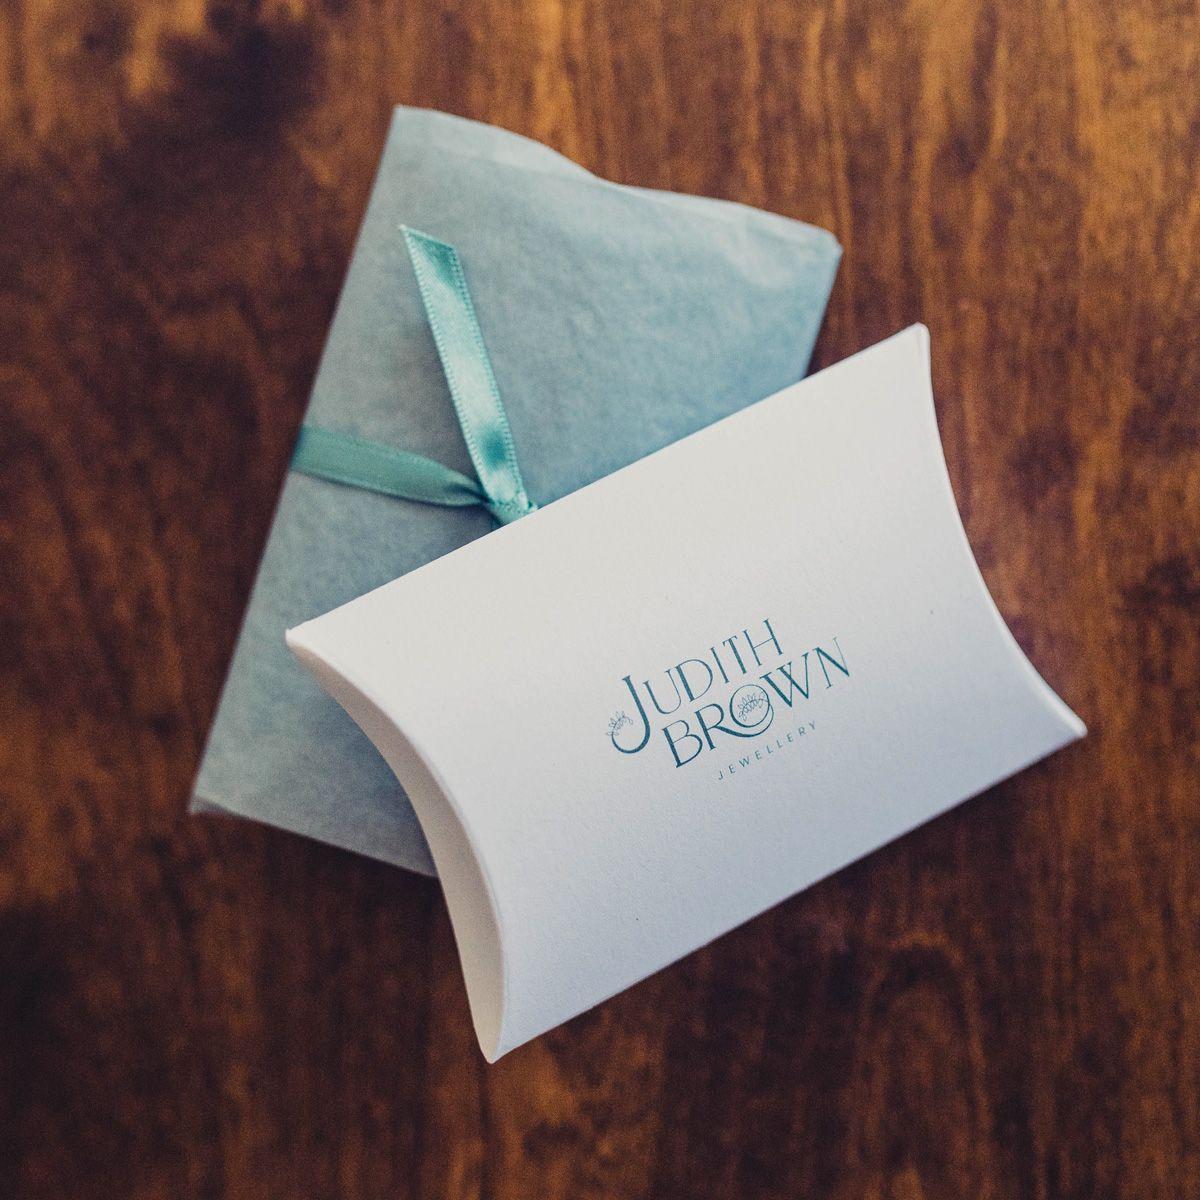 Judith Brown Jewellery free gift wrap